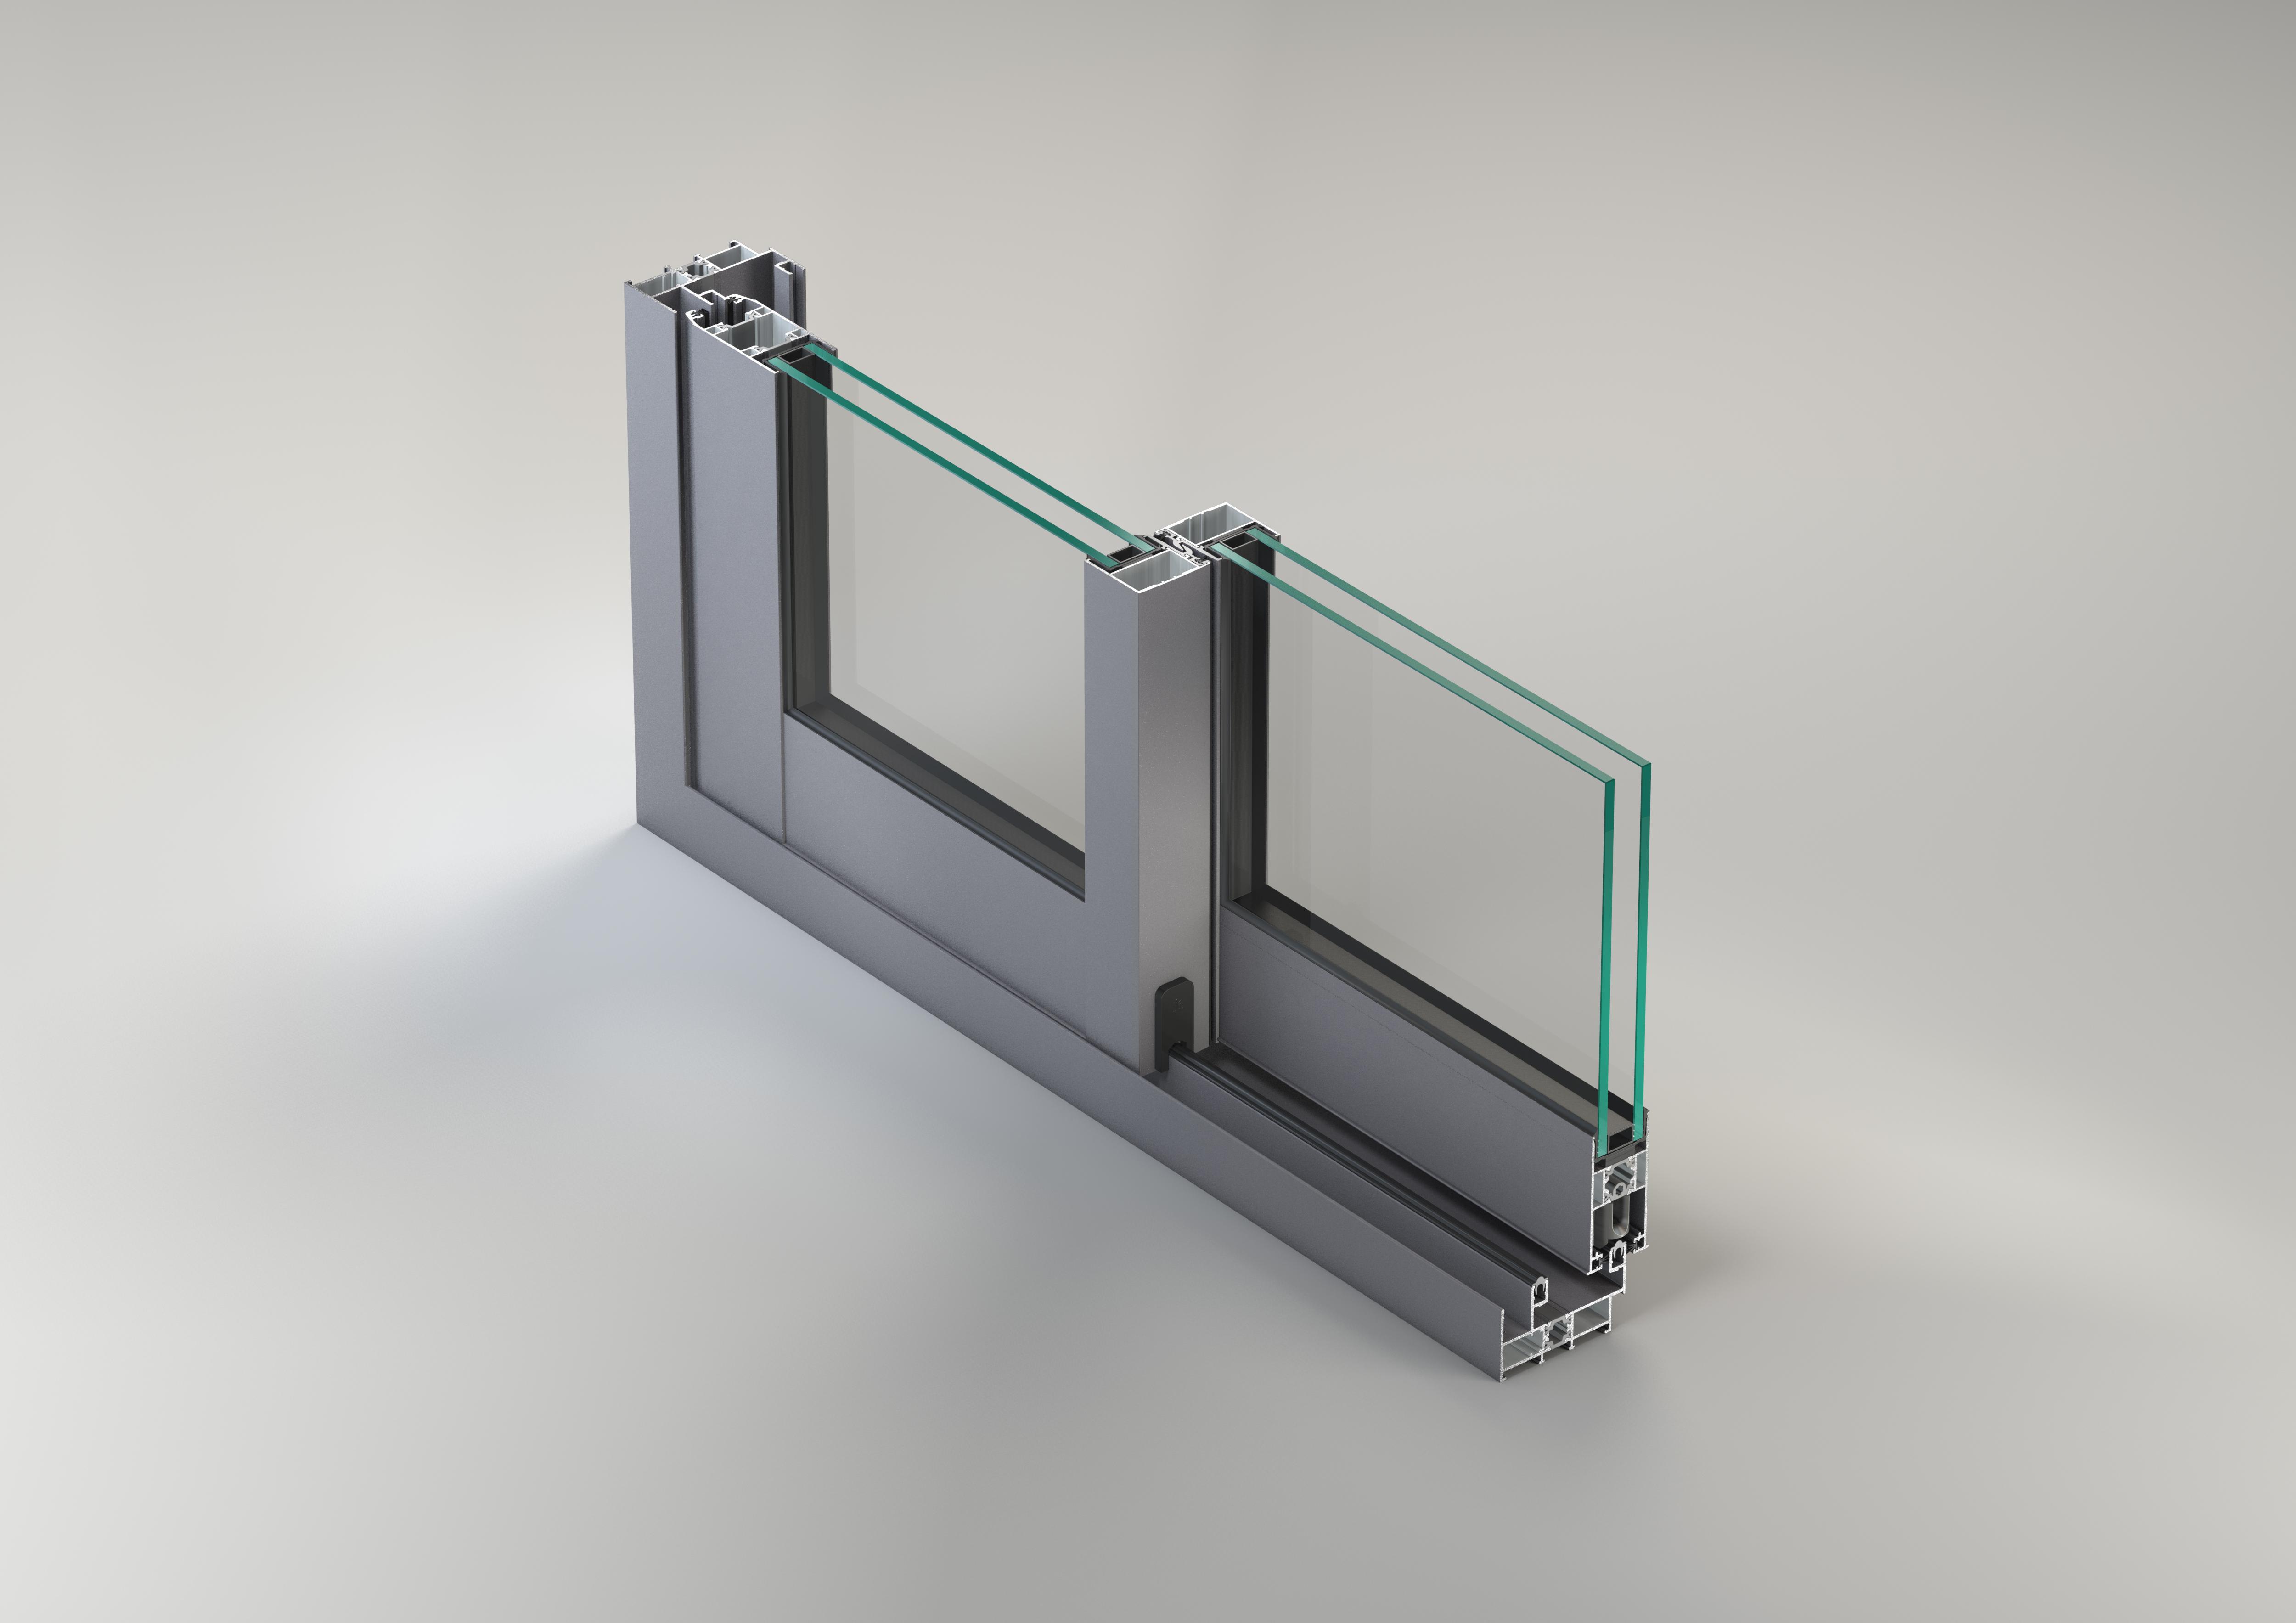 Sisteme aluminiu pentru usi glisante LEYKOM METRA - Poza 3